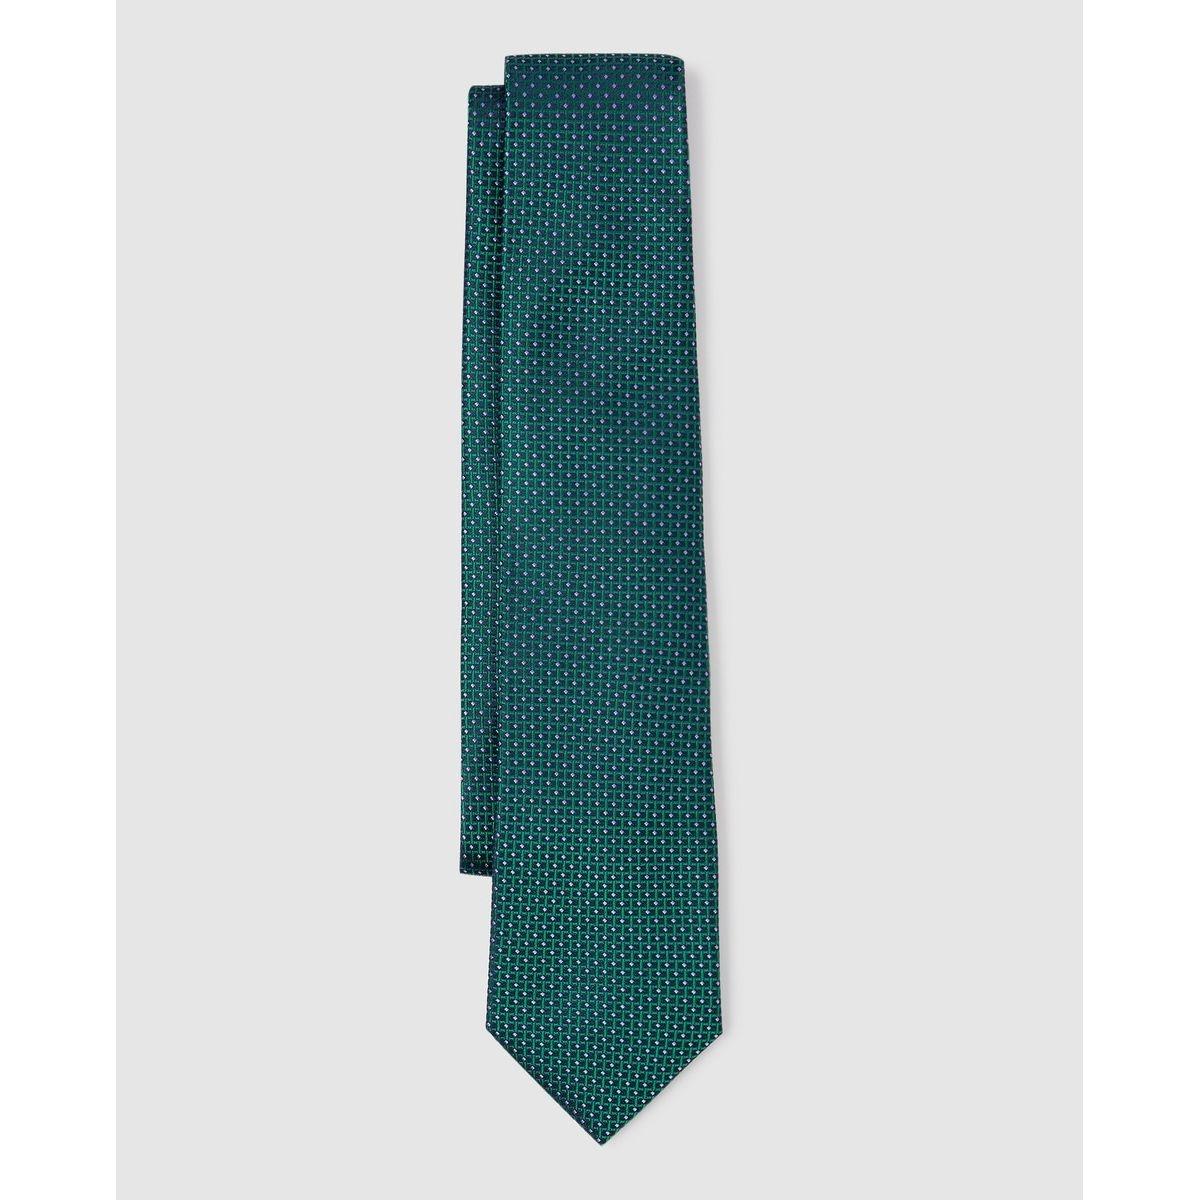 Cravate en soie minitexture